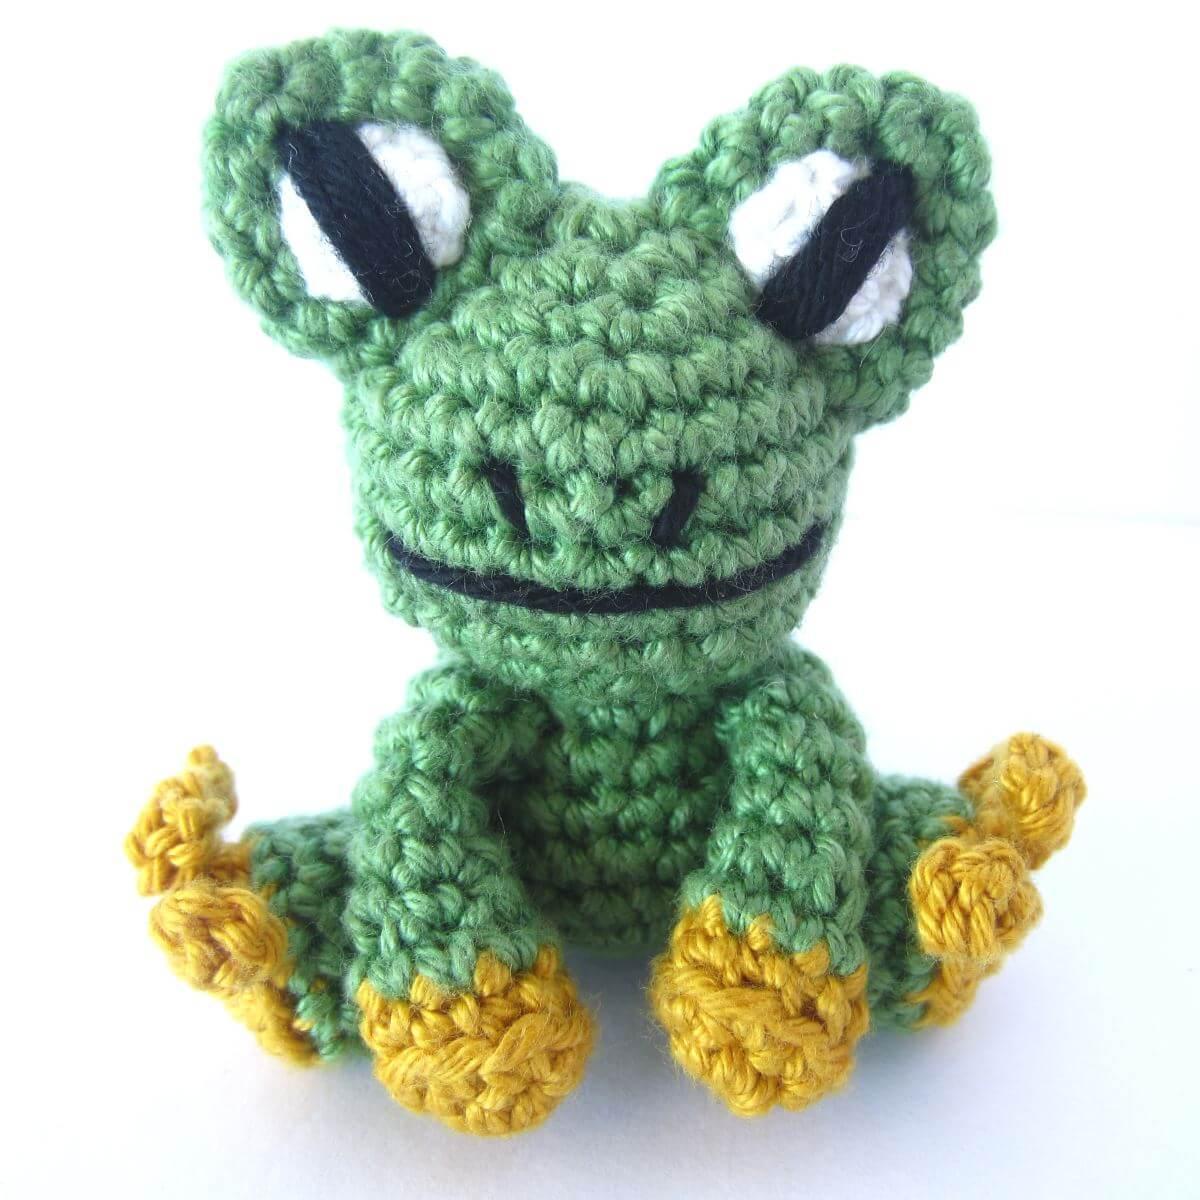 Amigurumi Crochet Frog : Amigurumi Crochet Animals Archives - Supergurumi